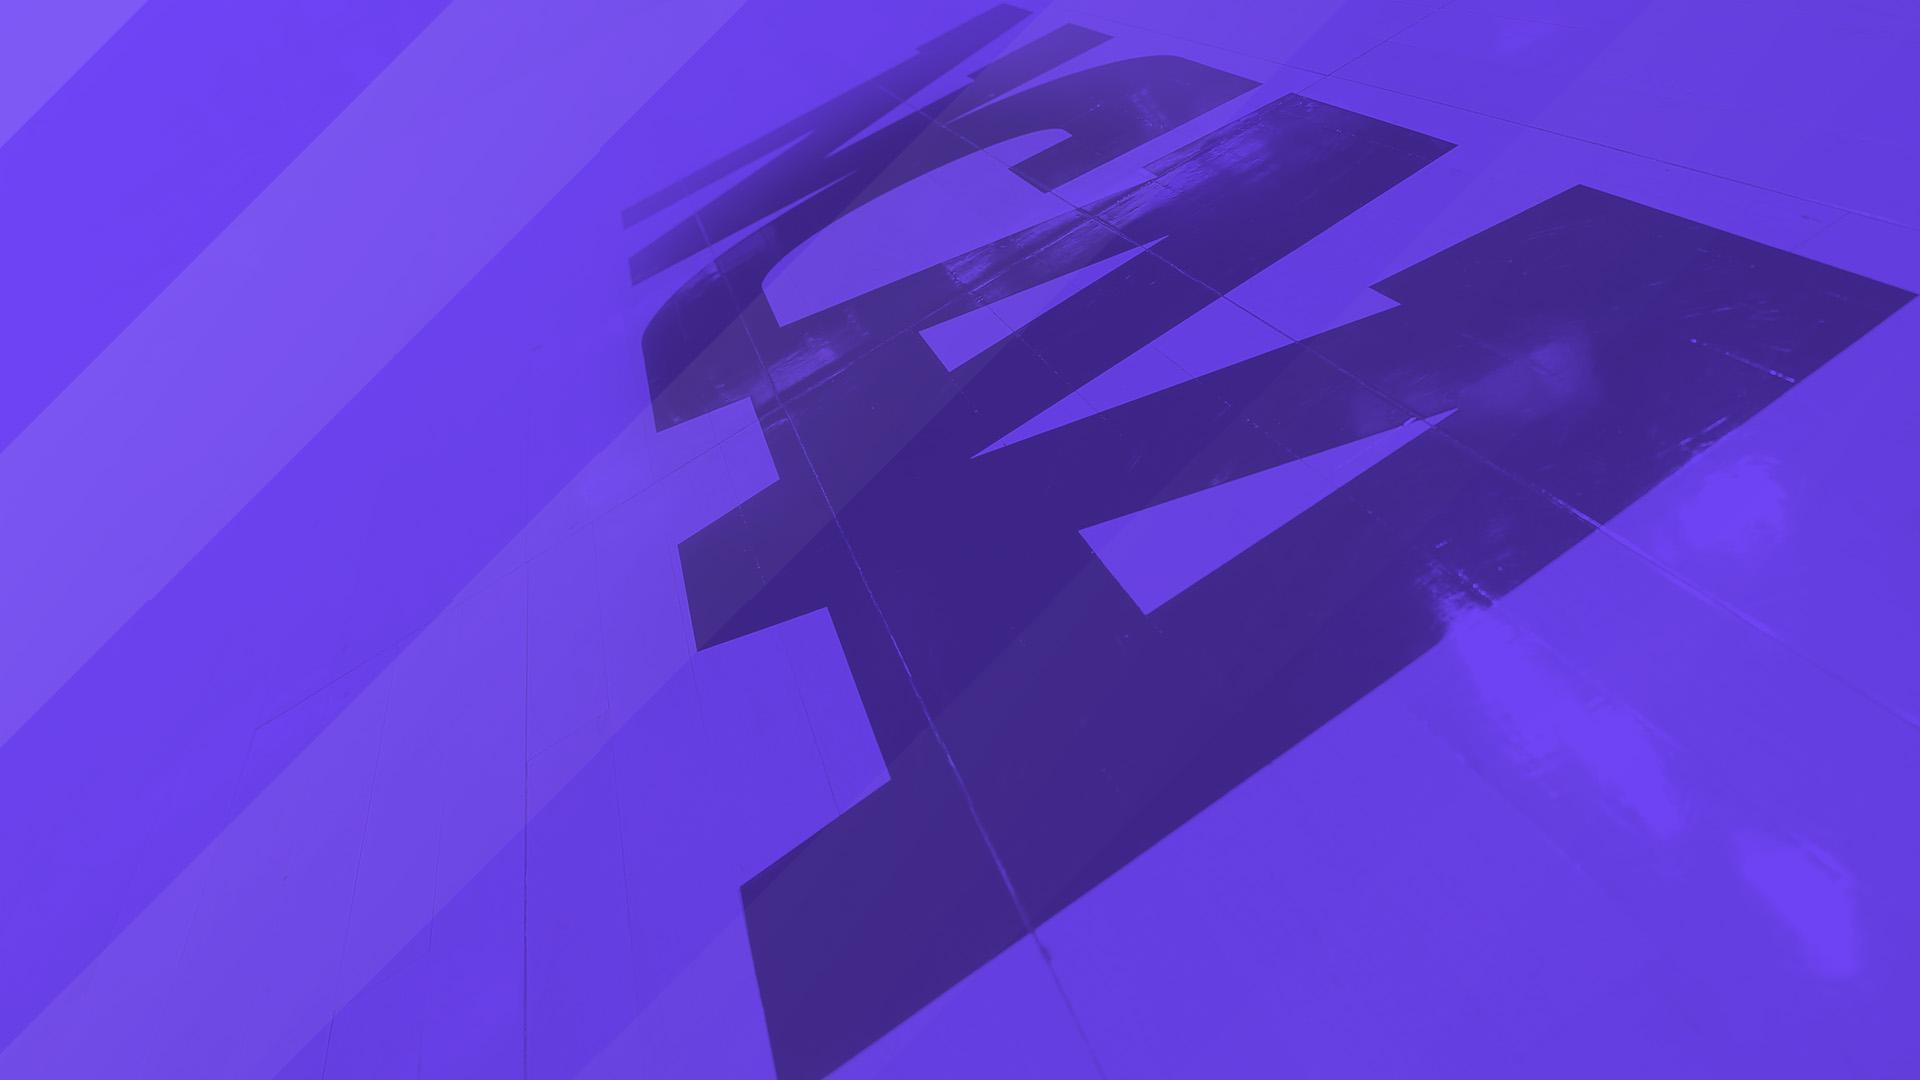 Ncaa-logo-ftr-neutraljpg_1x78rt0oei1t81c9gi07olbrin